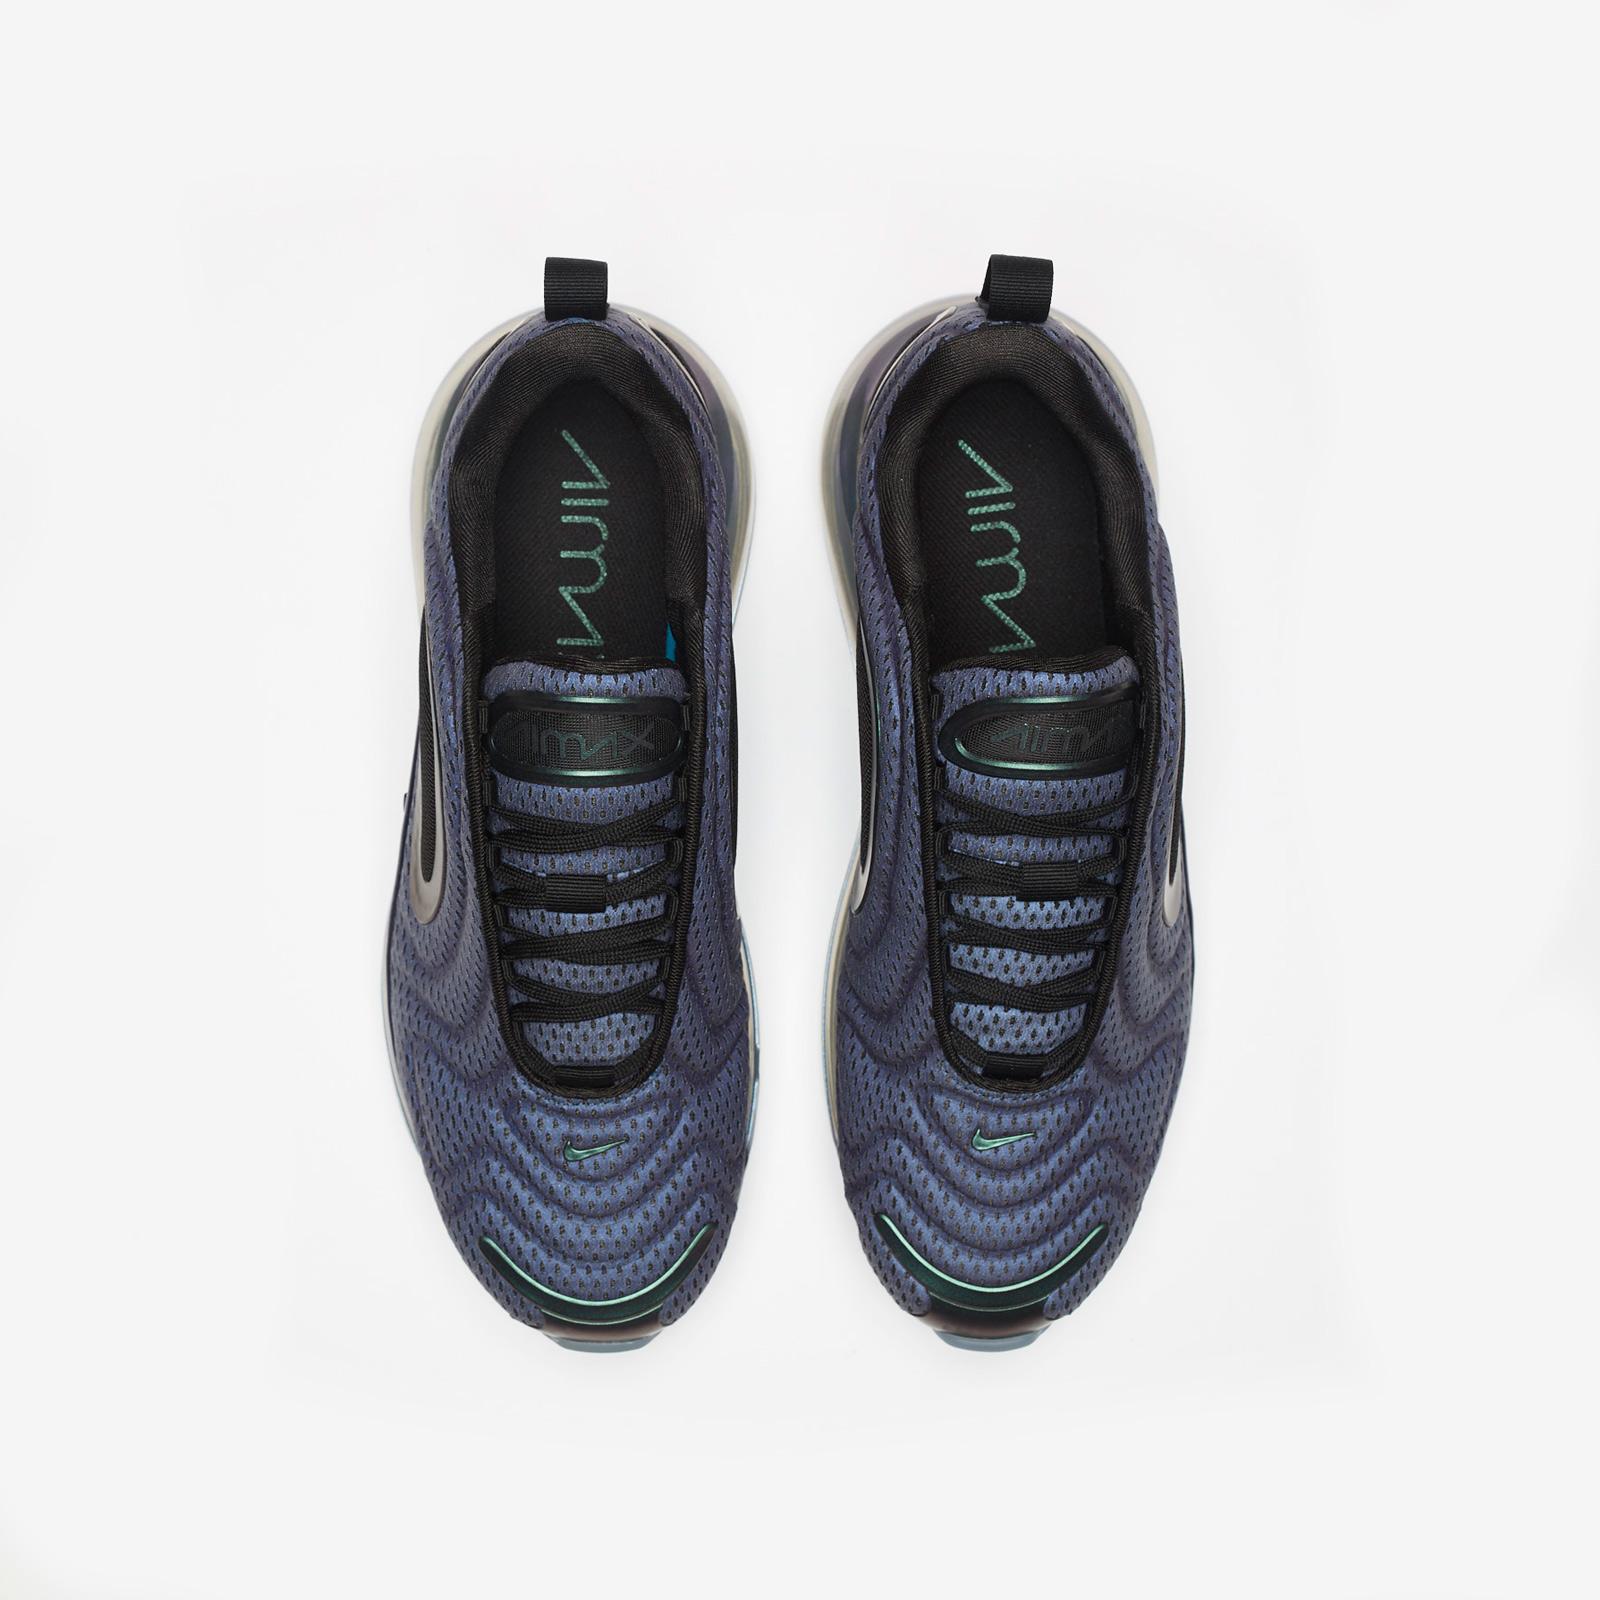 3ba9e1b471bd58 Nike Air Max 720 - Ao2924-001 - Sneakersnstuff